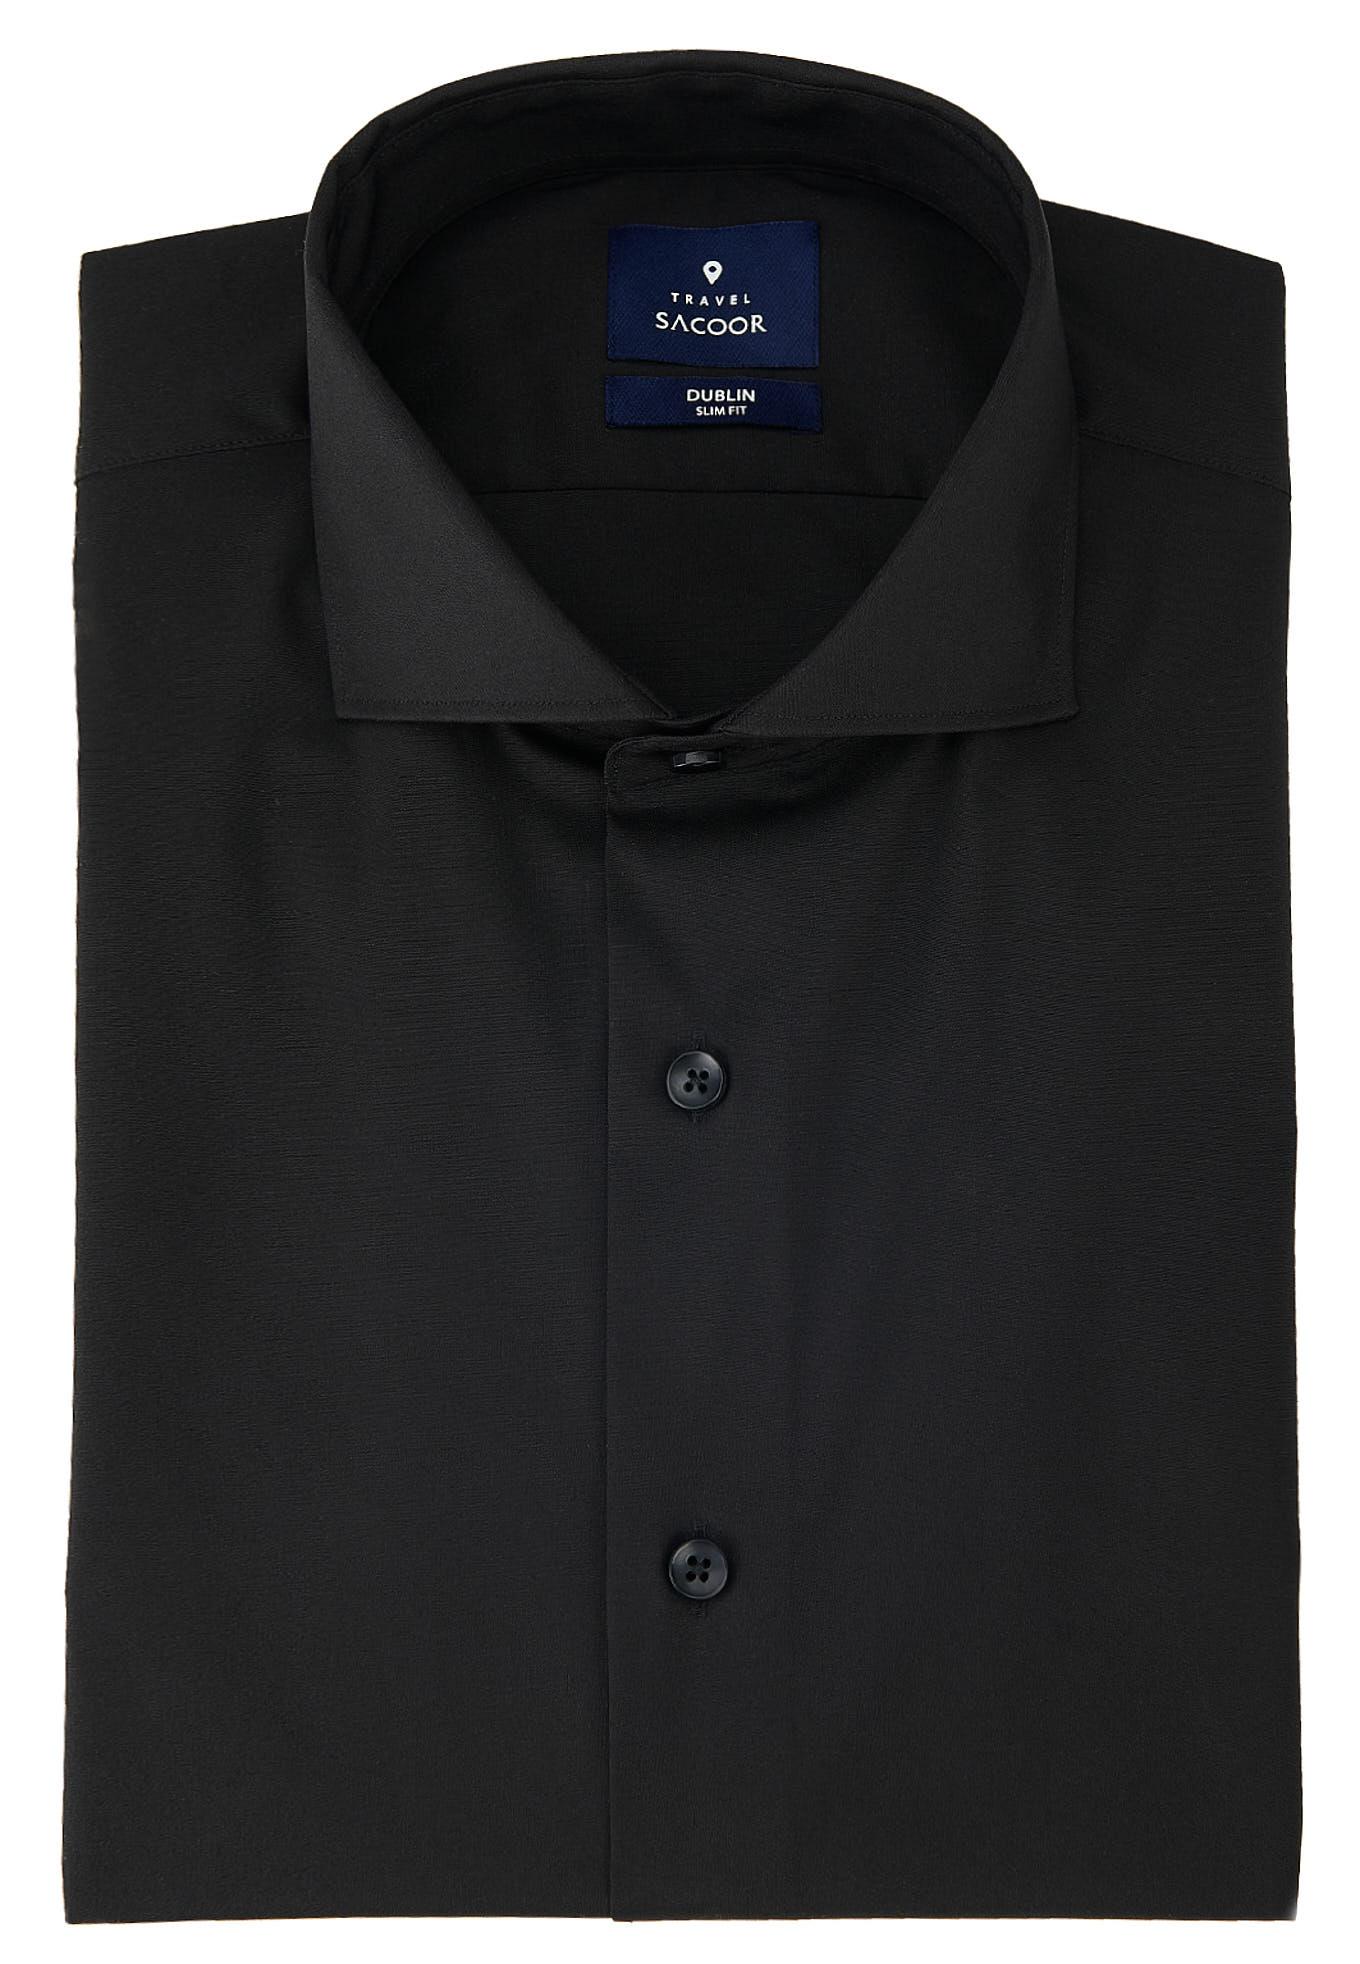 Shirt Black Formal Man